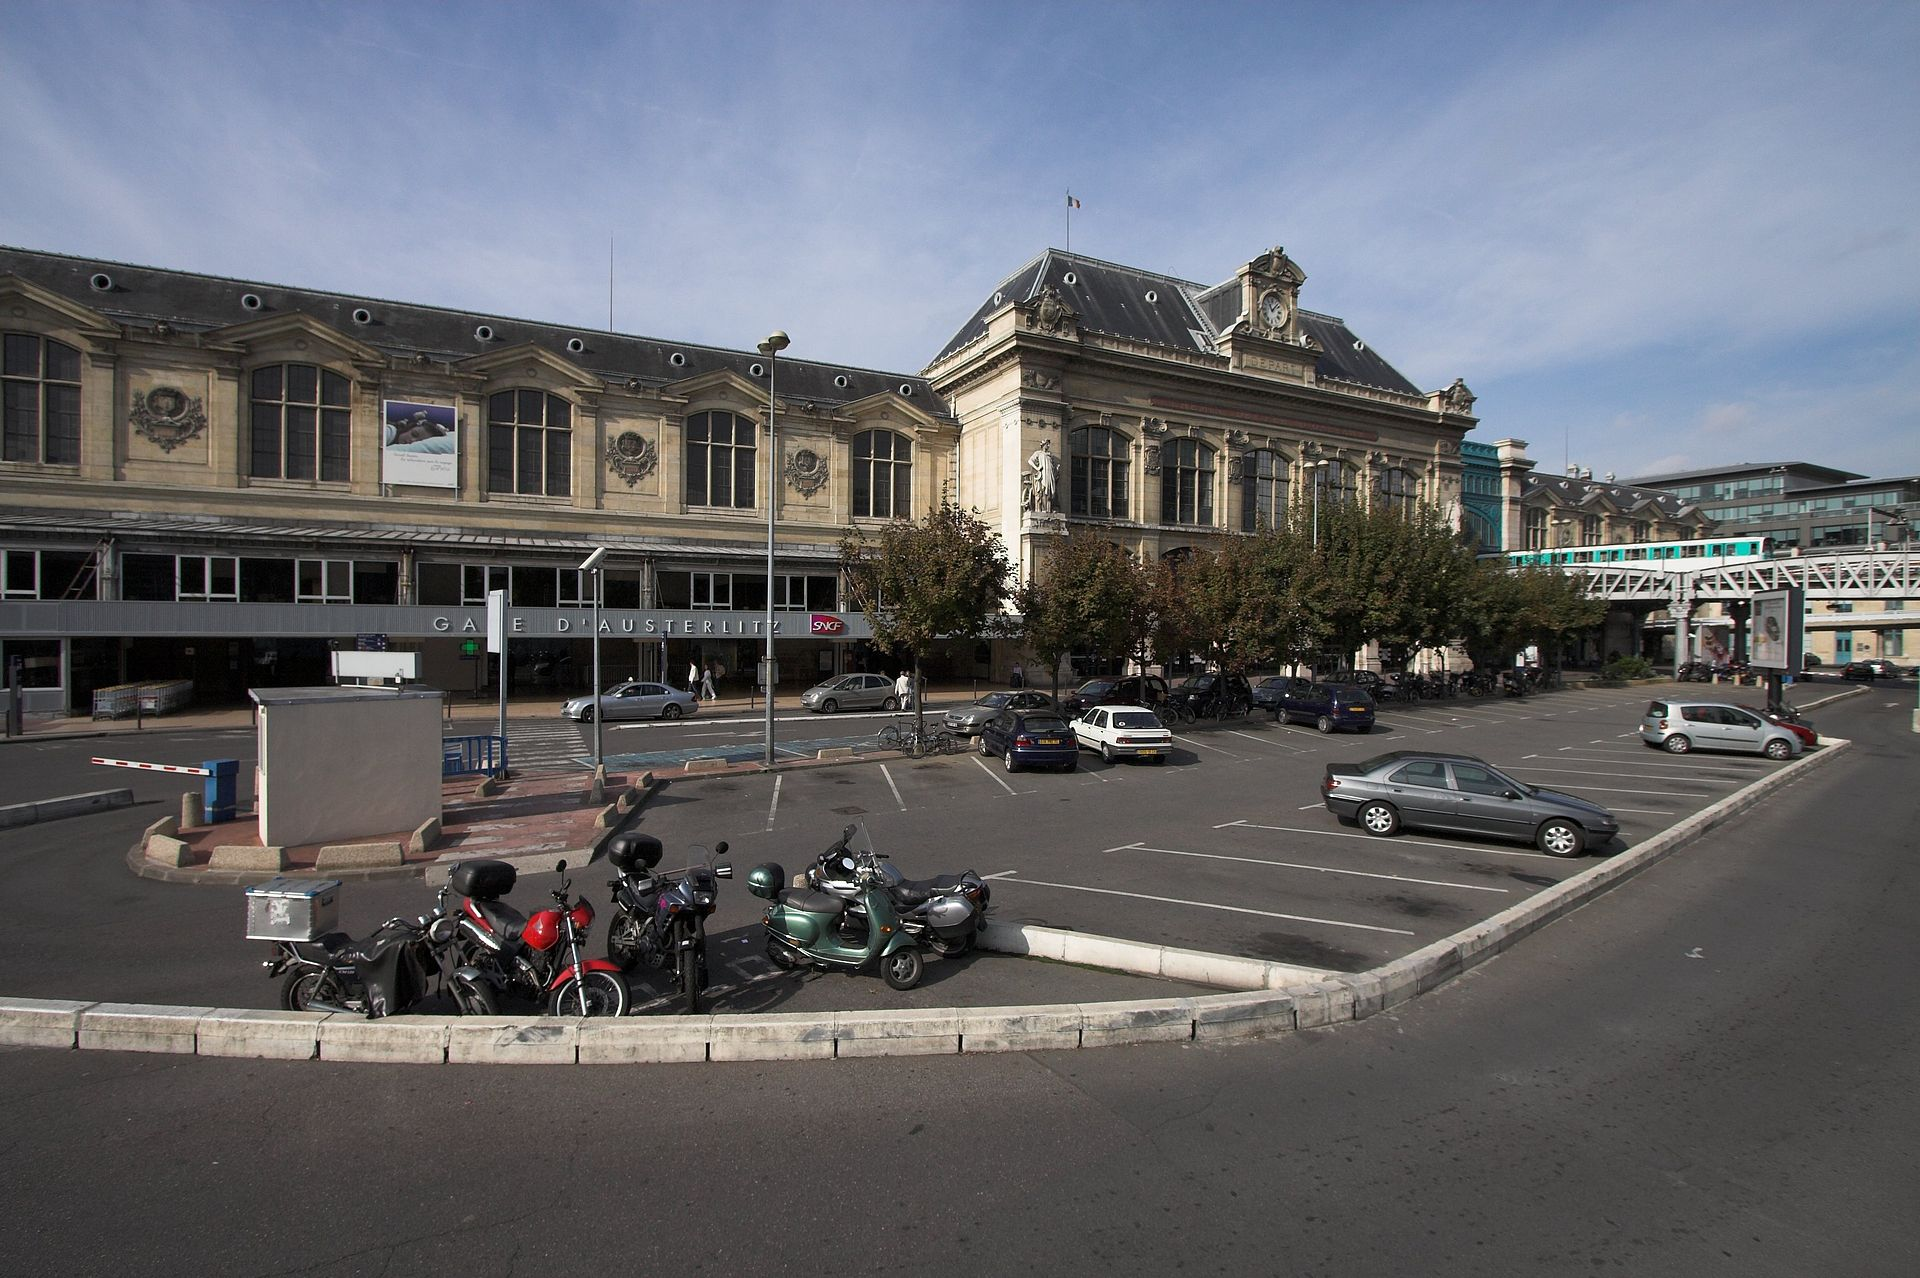 Gare_dAusterlitz_Paris_FRA_001